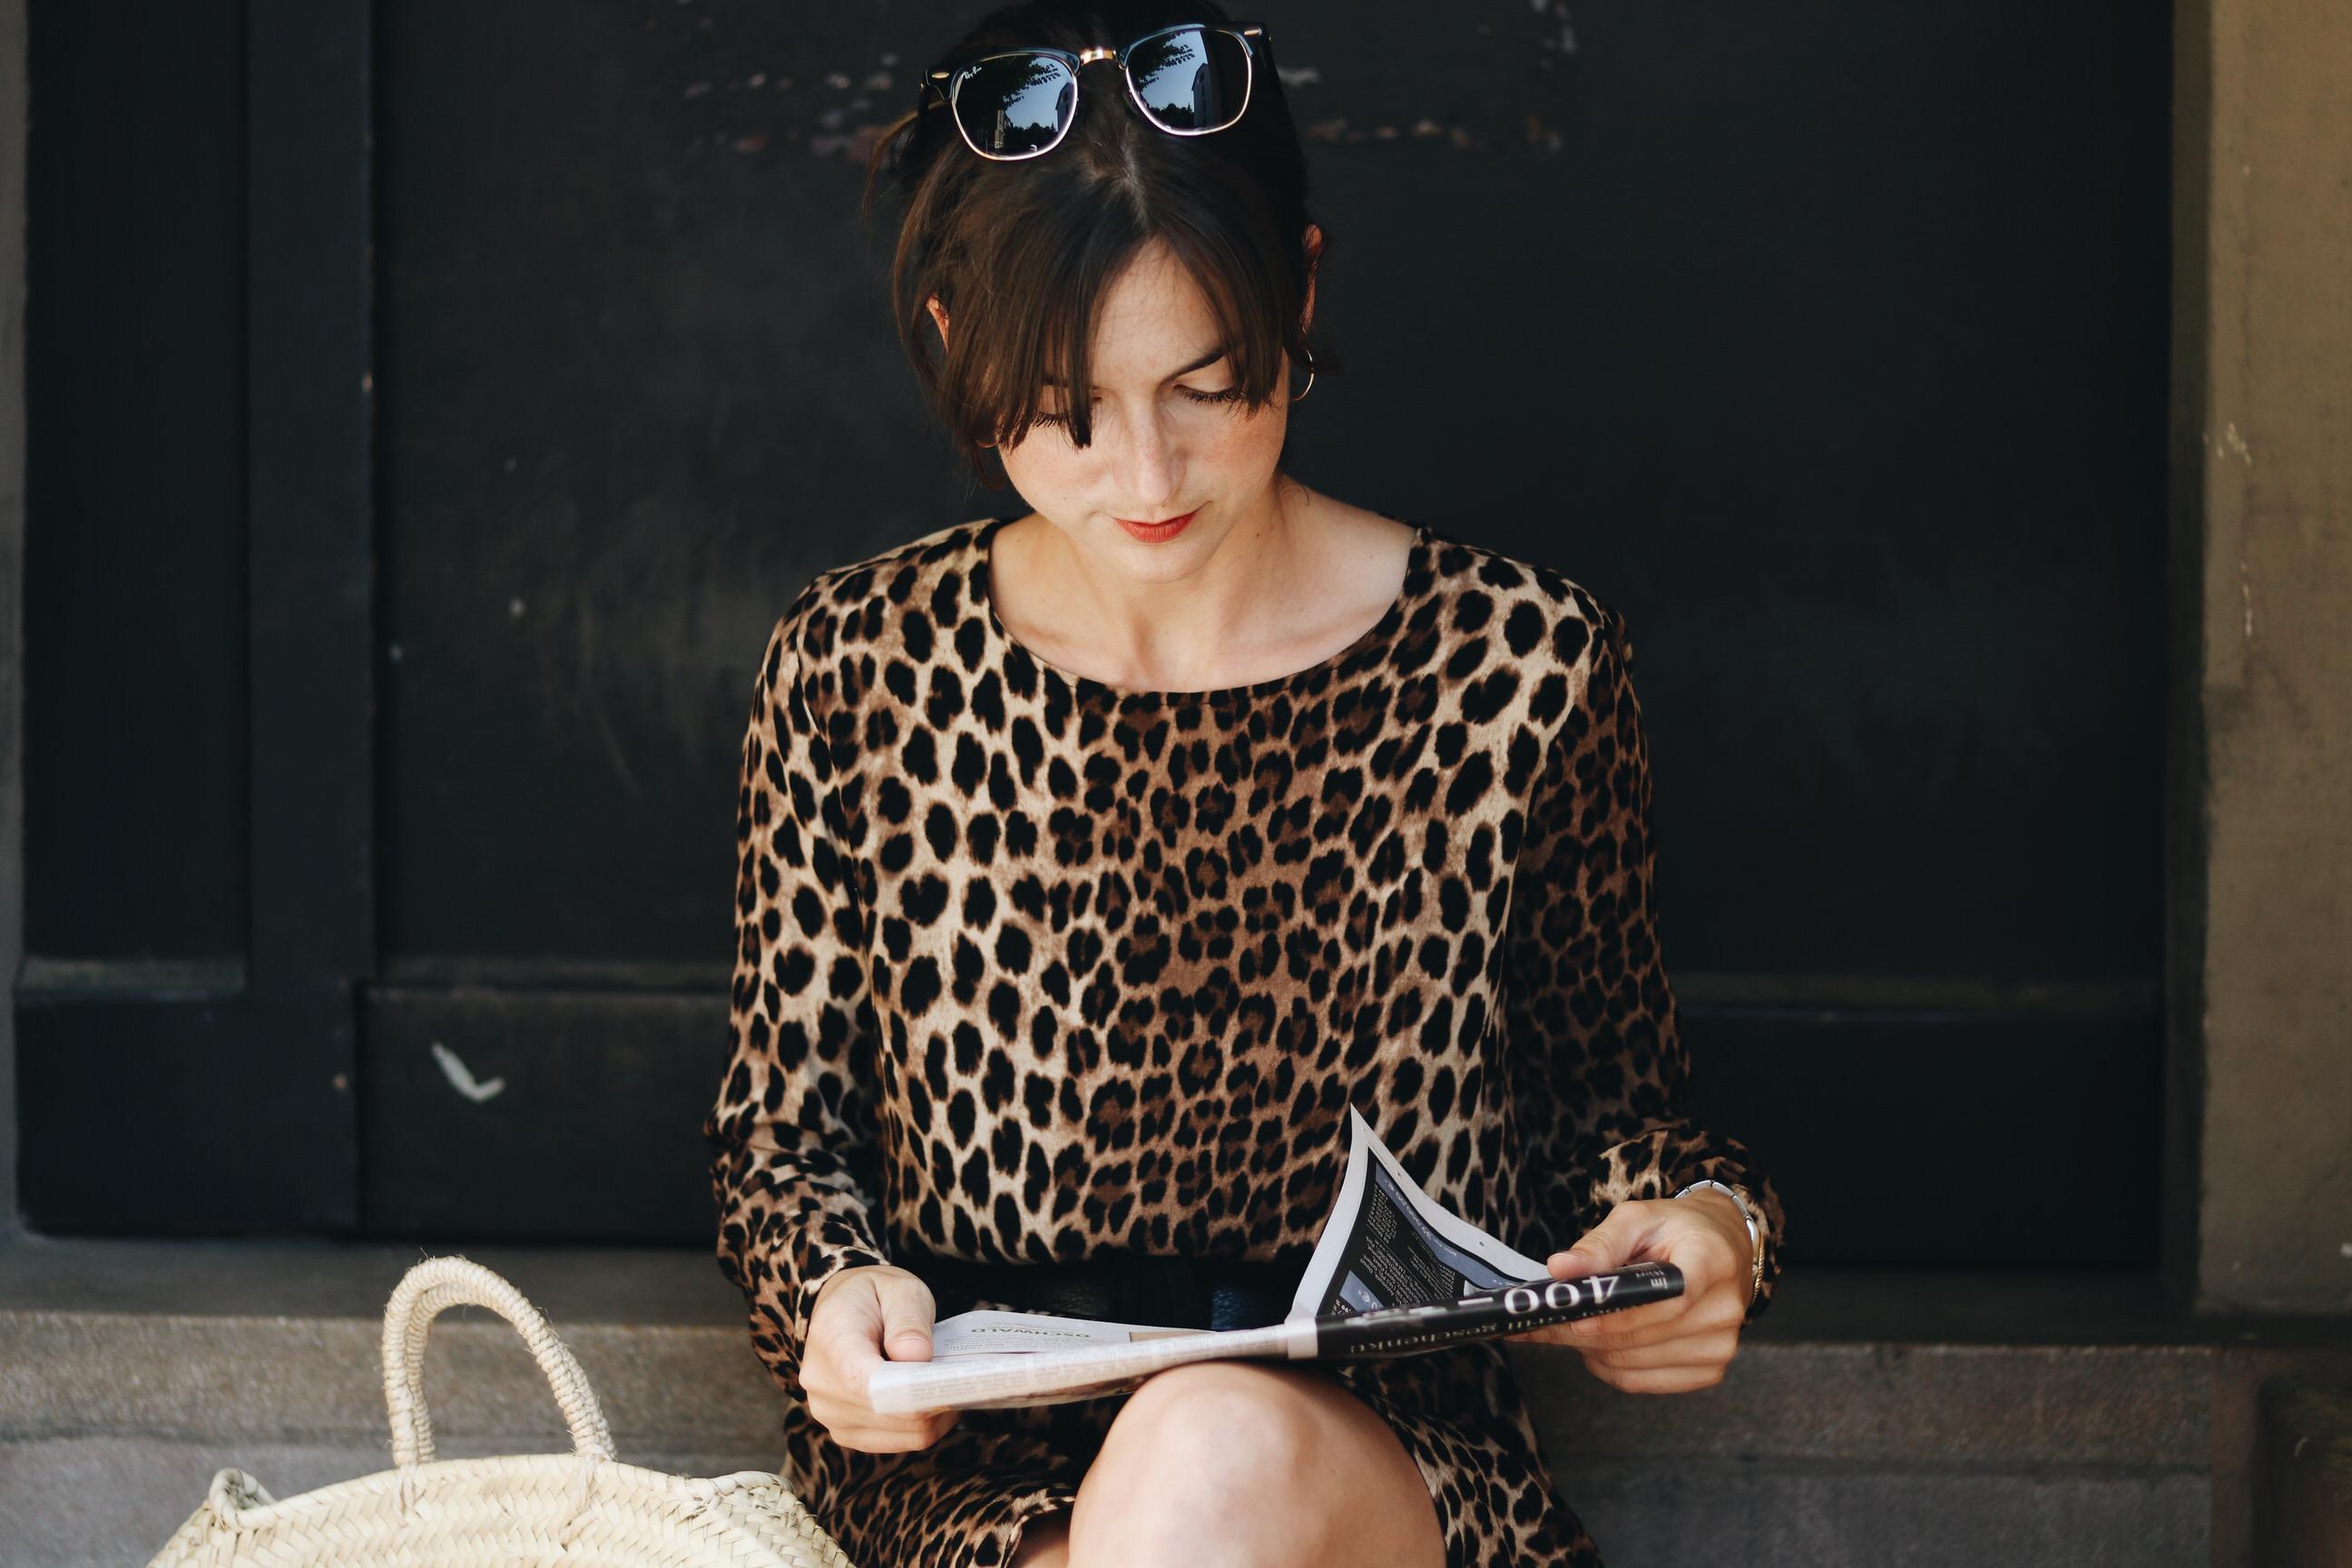 Leoprint Sommerkleid Kleid Leopardenmuster Outfit Modeblog Fashionblog Neele Rayban Sonnenbrille